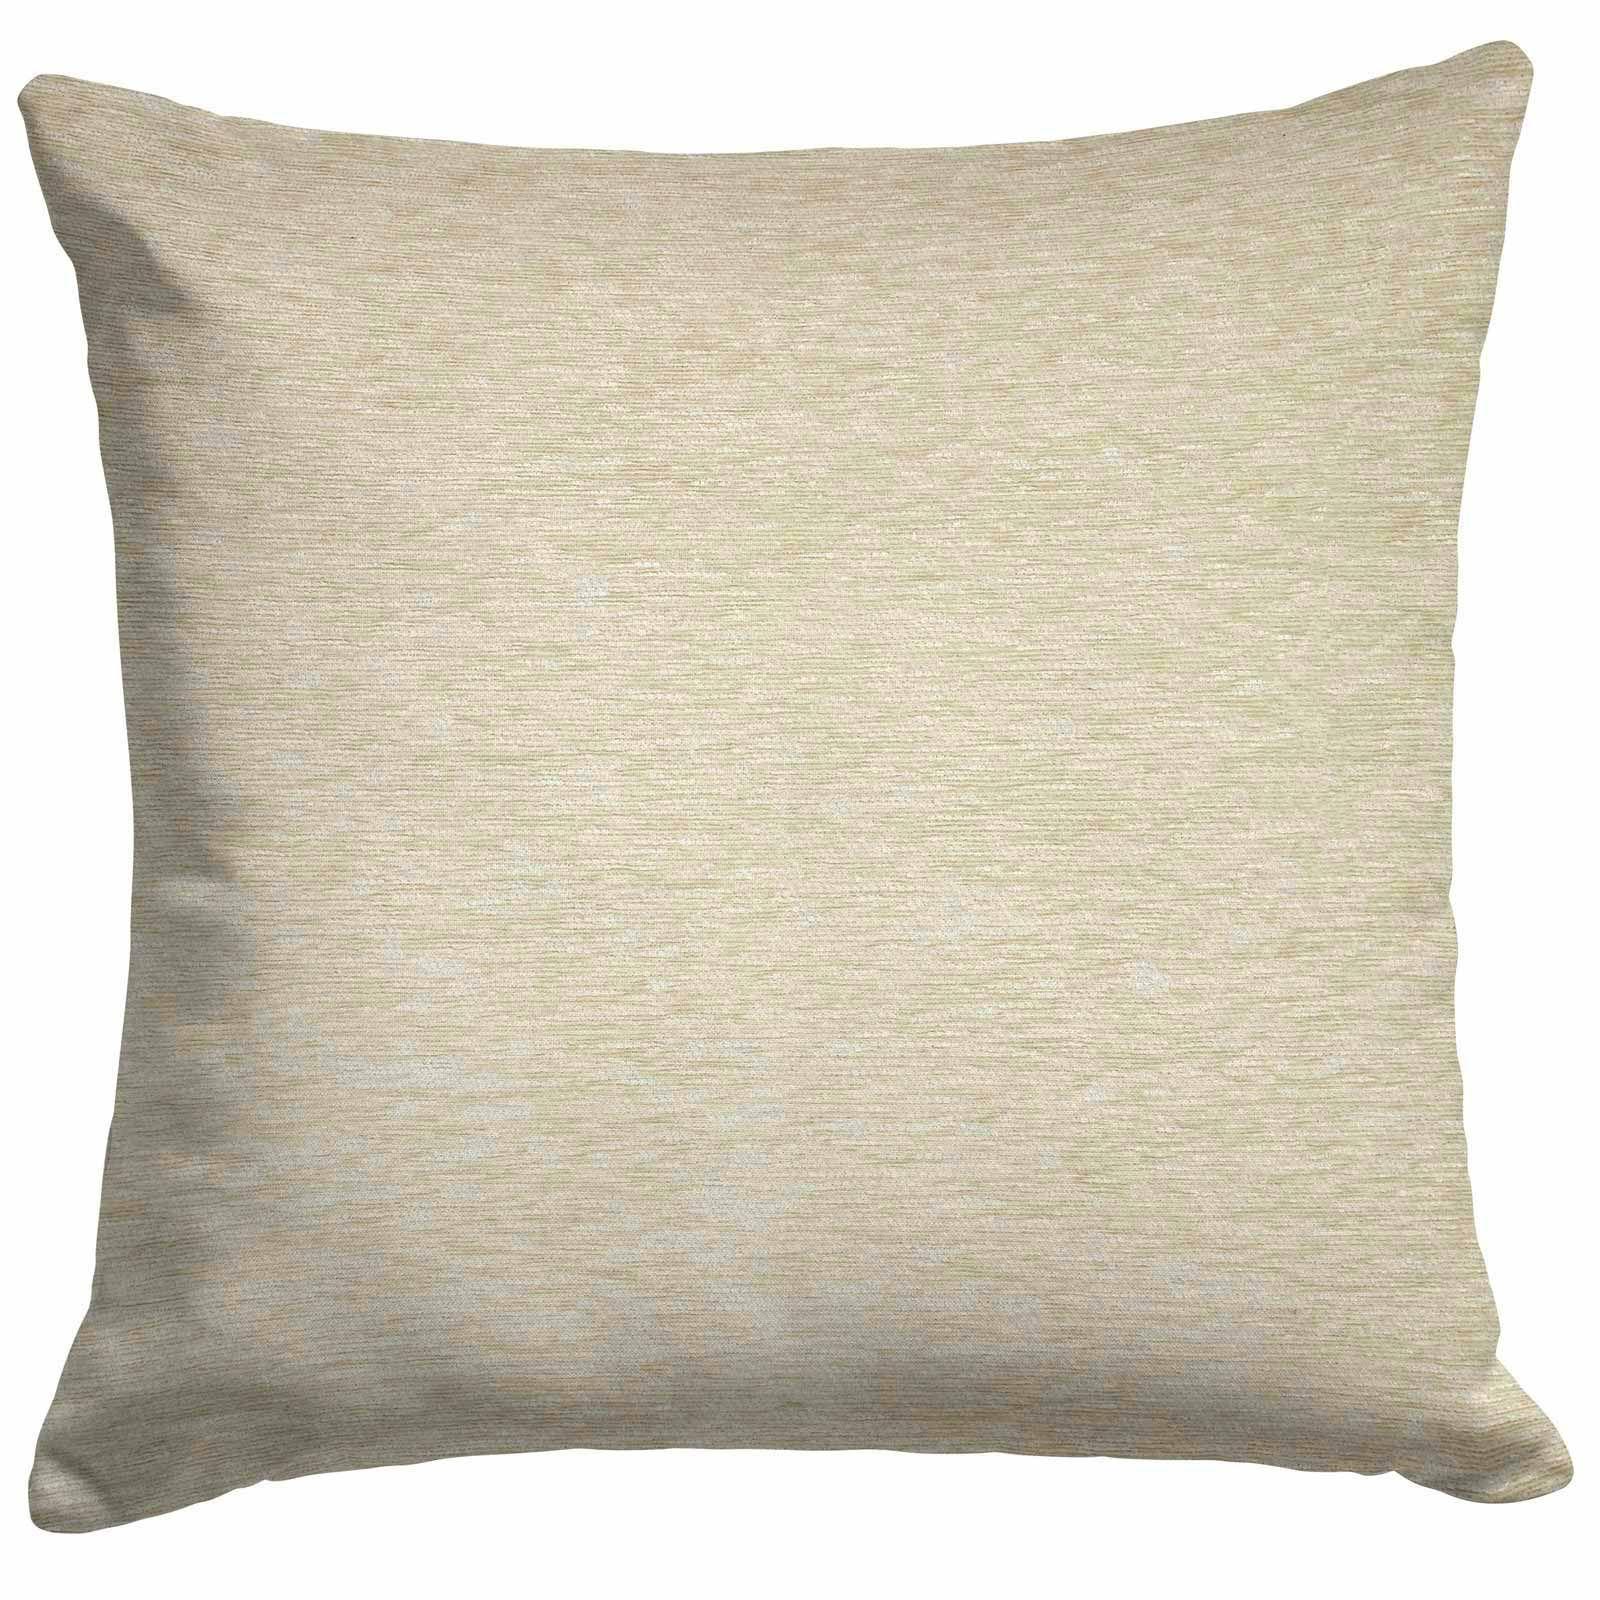 Set-of-2-Chenille-Cushion-Covers-Luxury-Plain-Cushions-Cover-Pairs-18-034-x-18-034 thumbnail 35